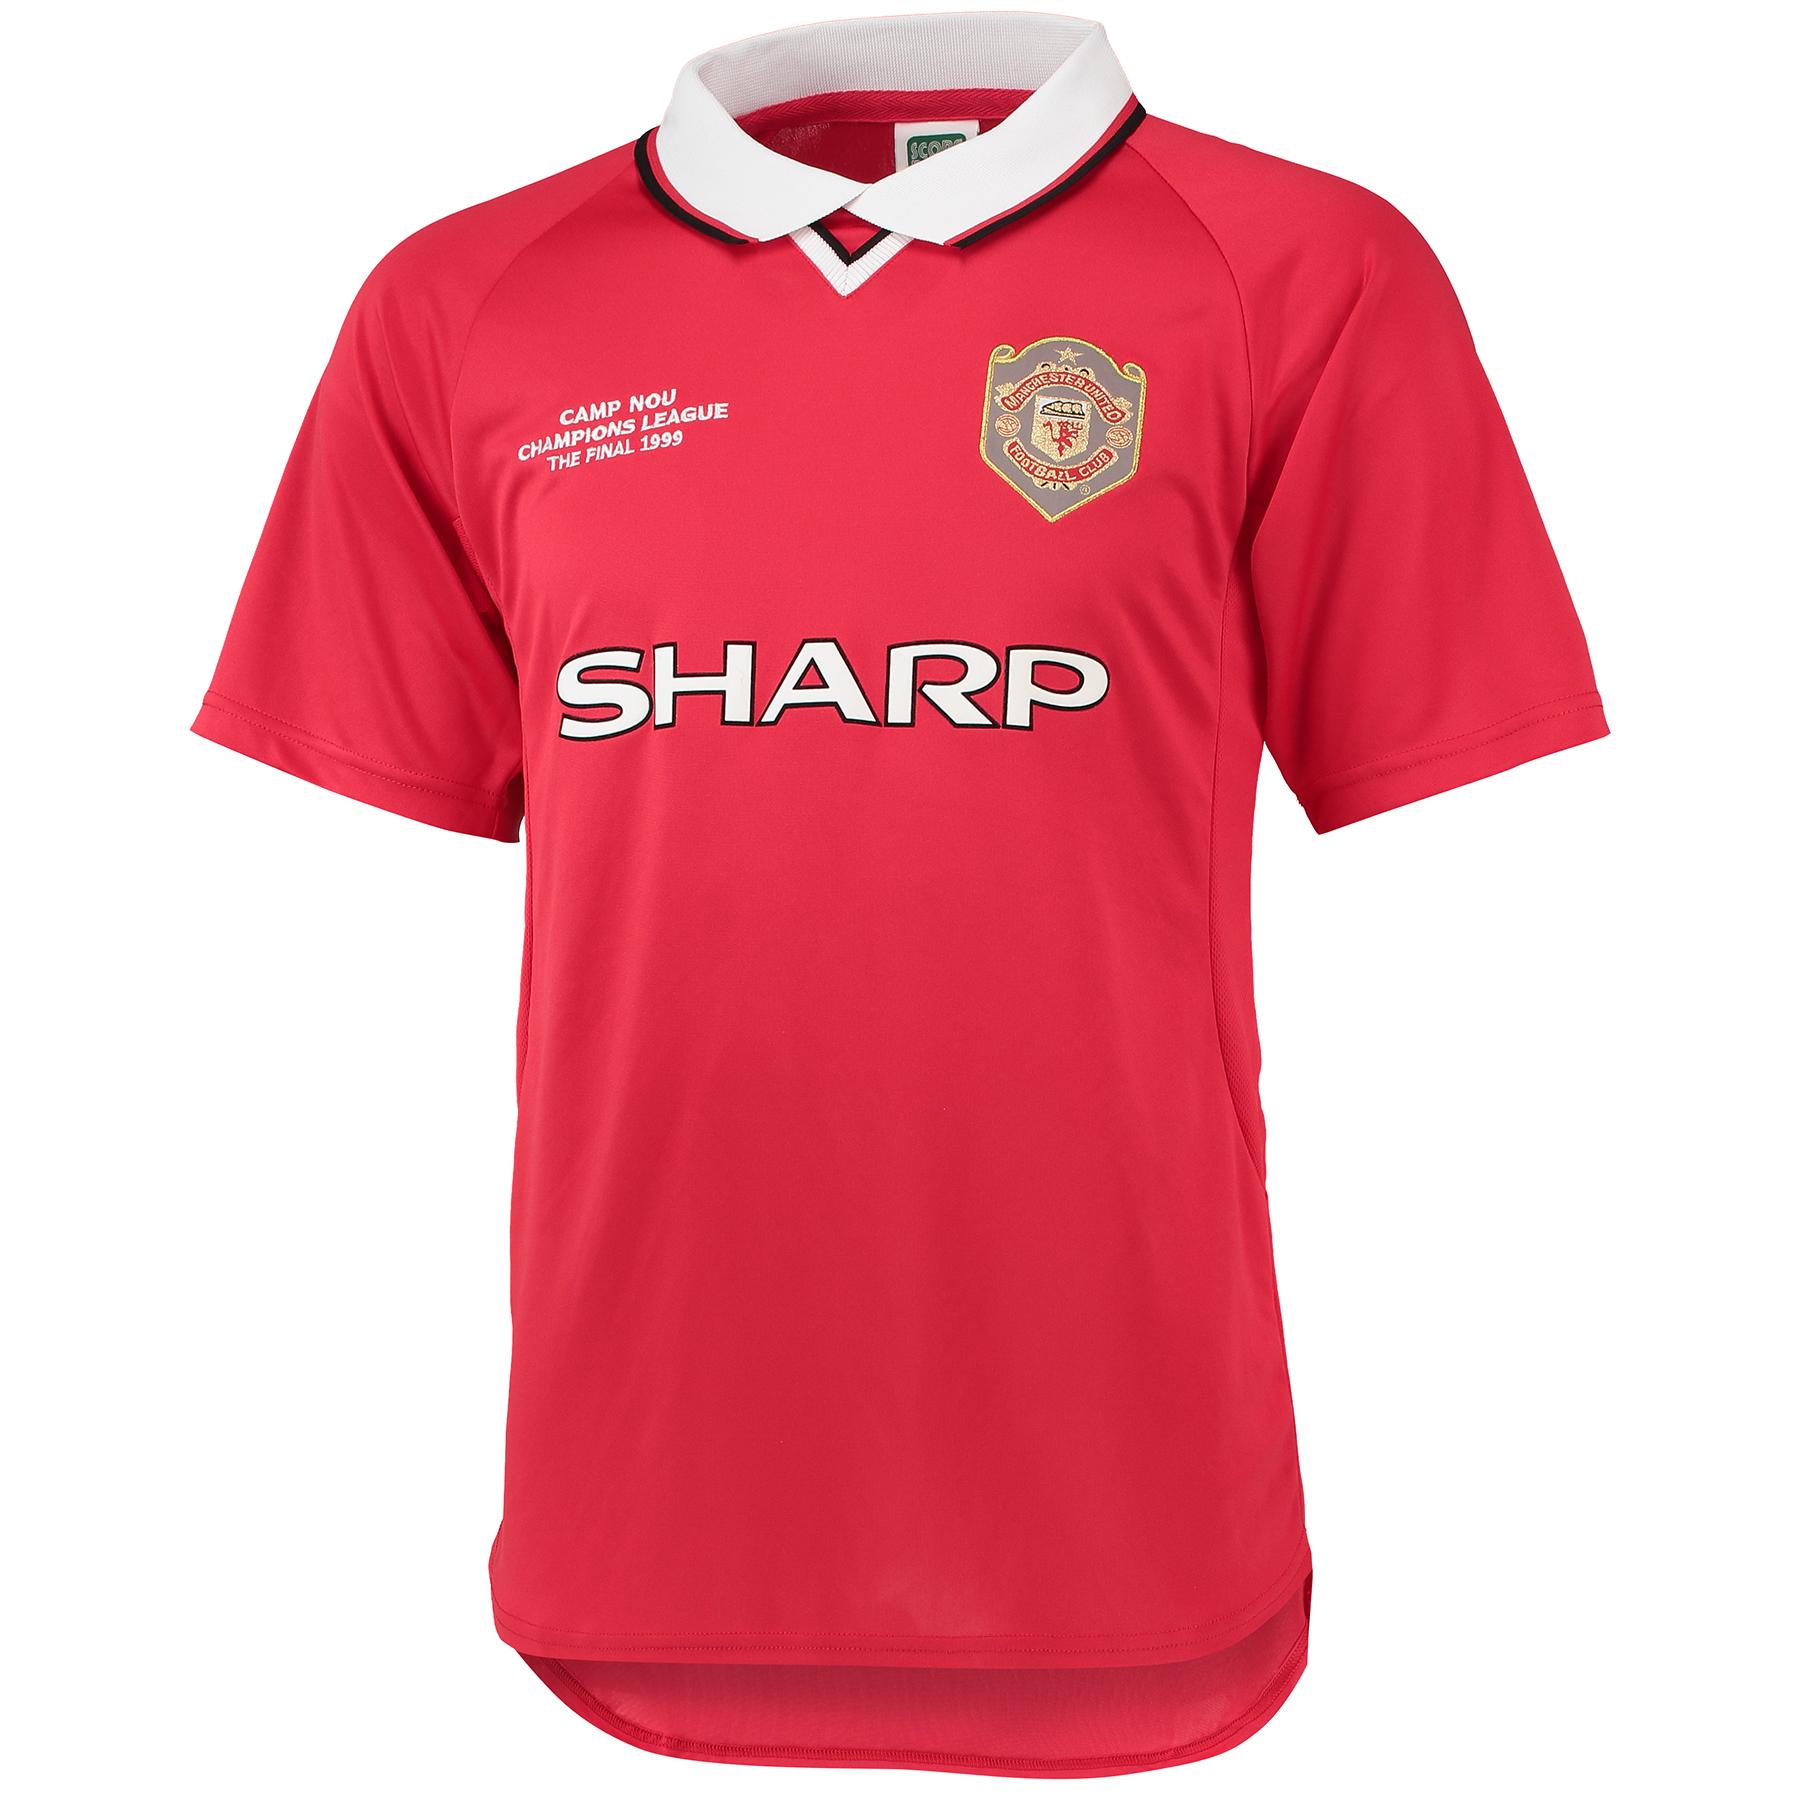 Manchester United Retro Champions League Final Shirt 1999